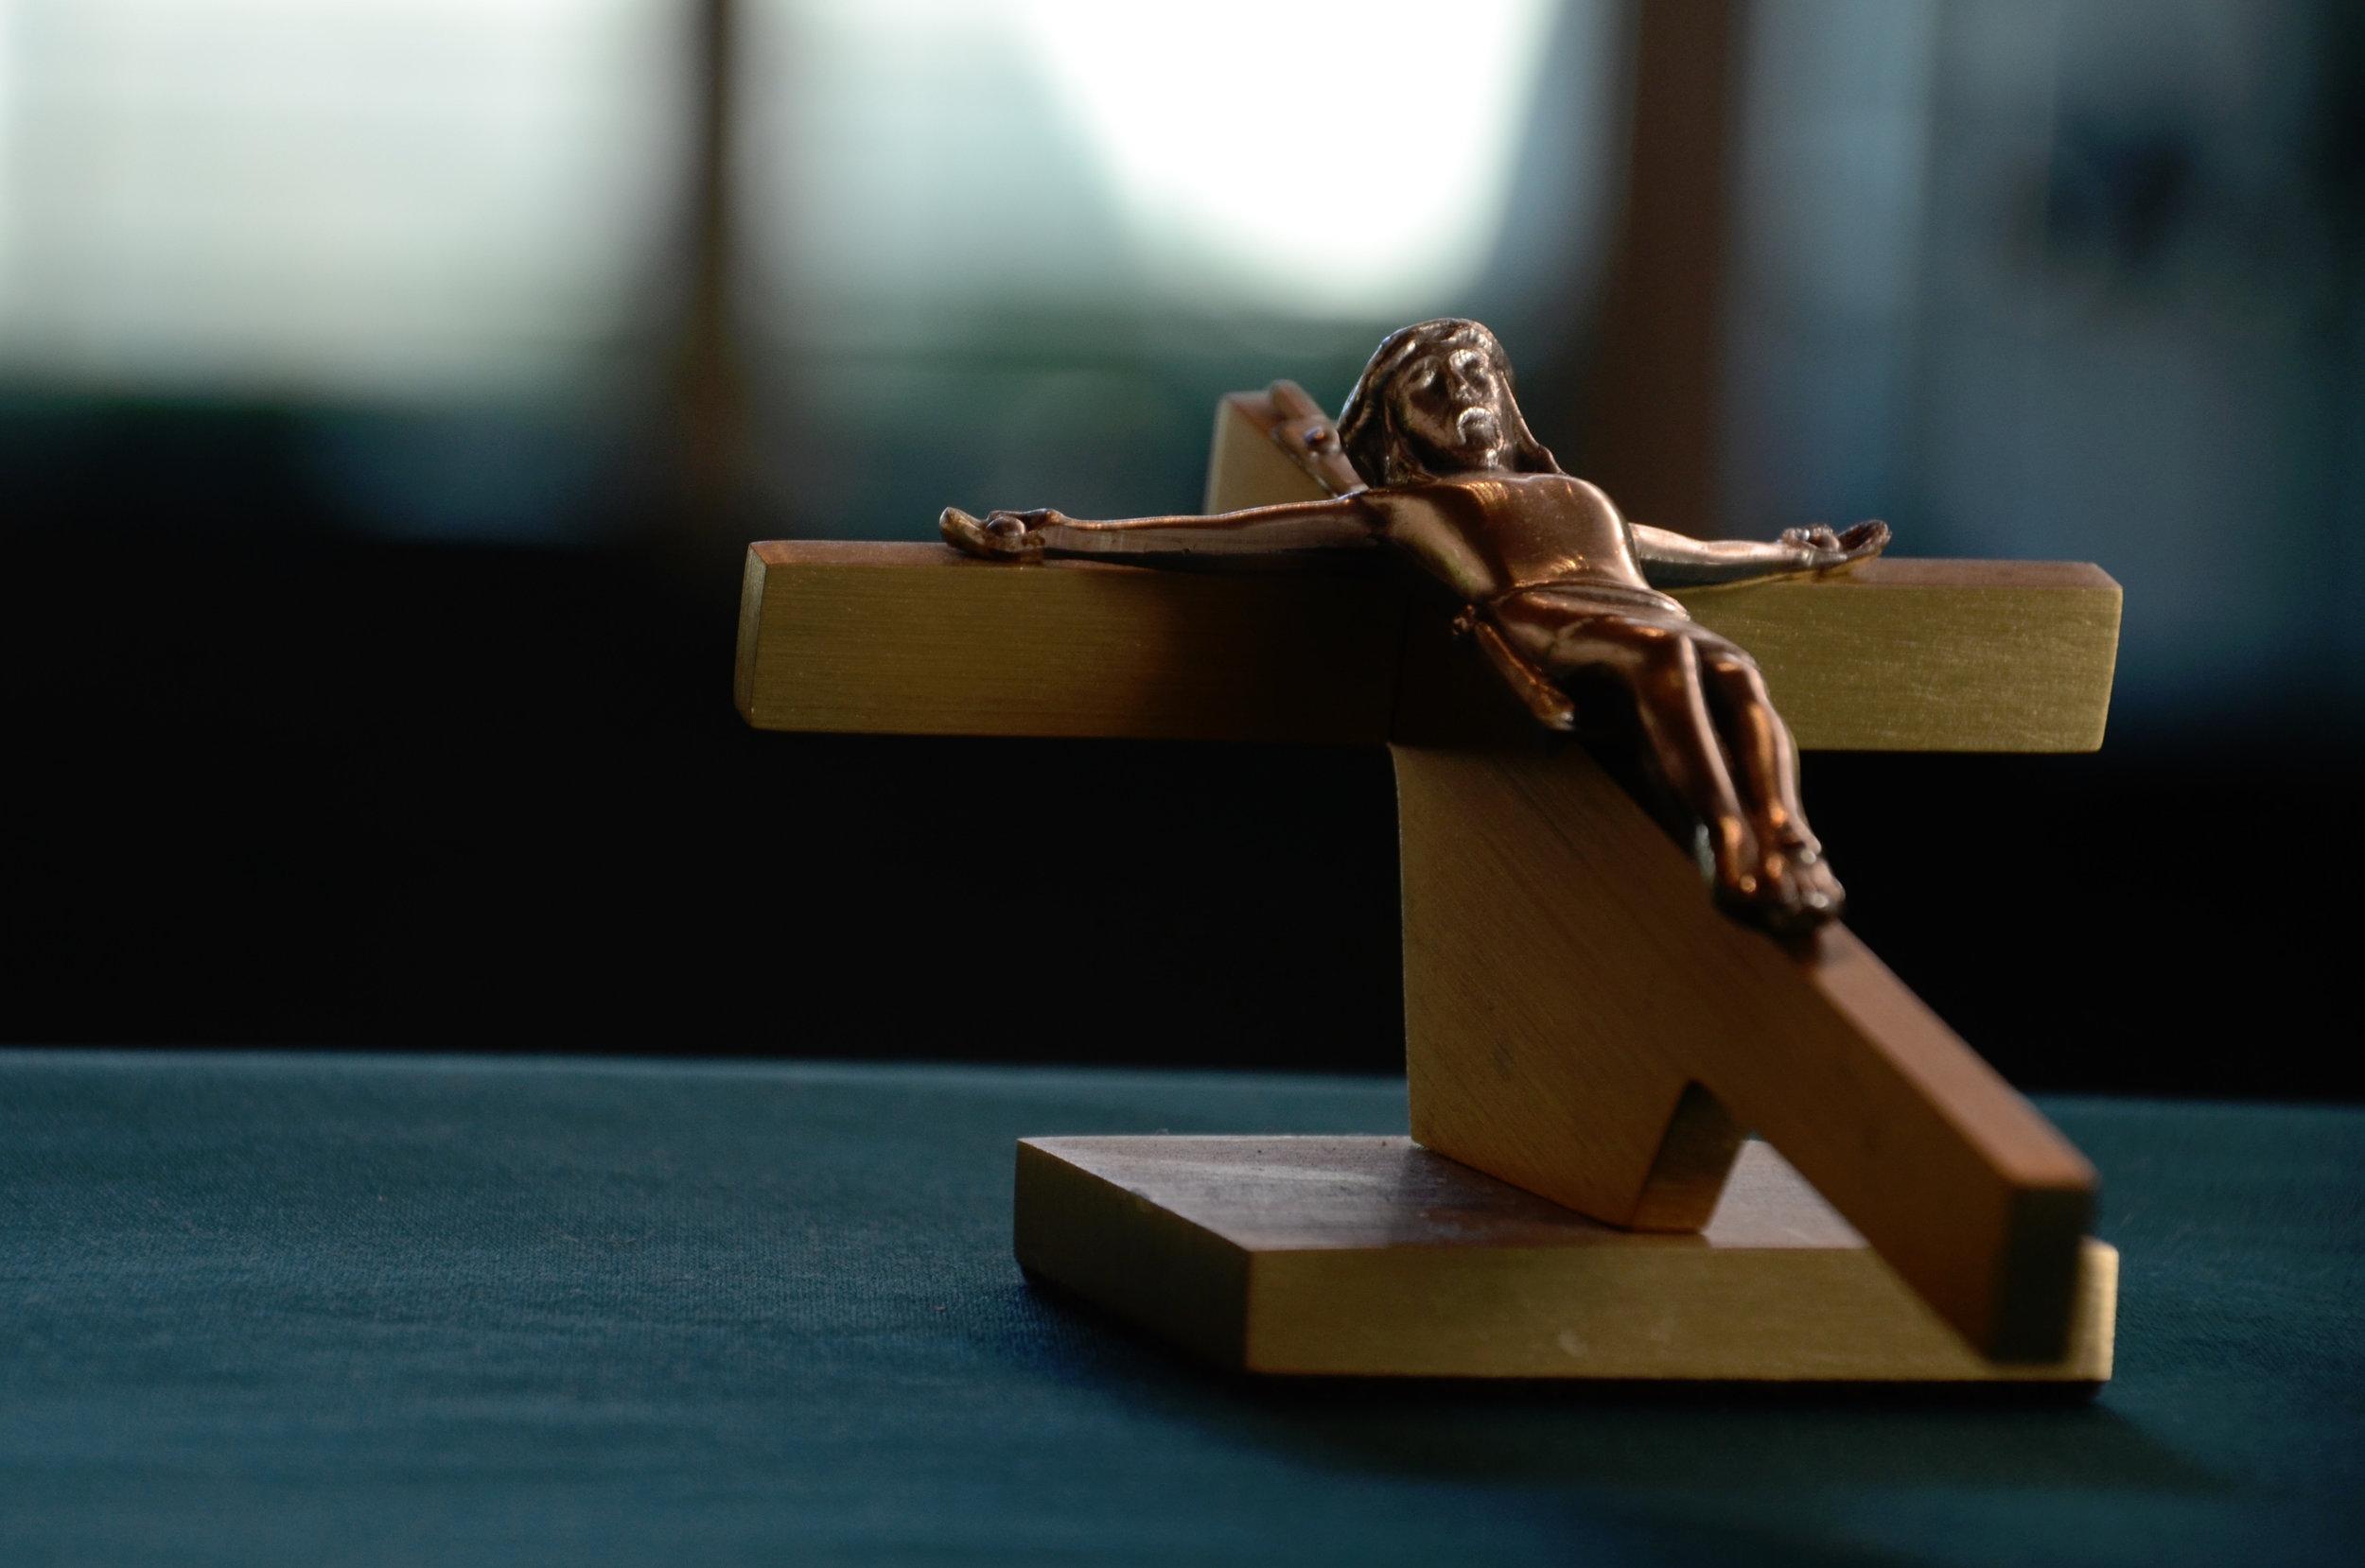 Jesus Bomb by Yescka